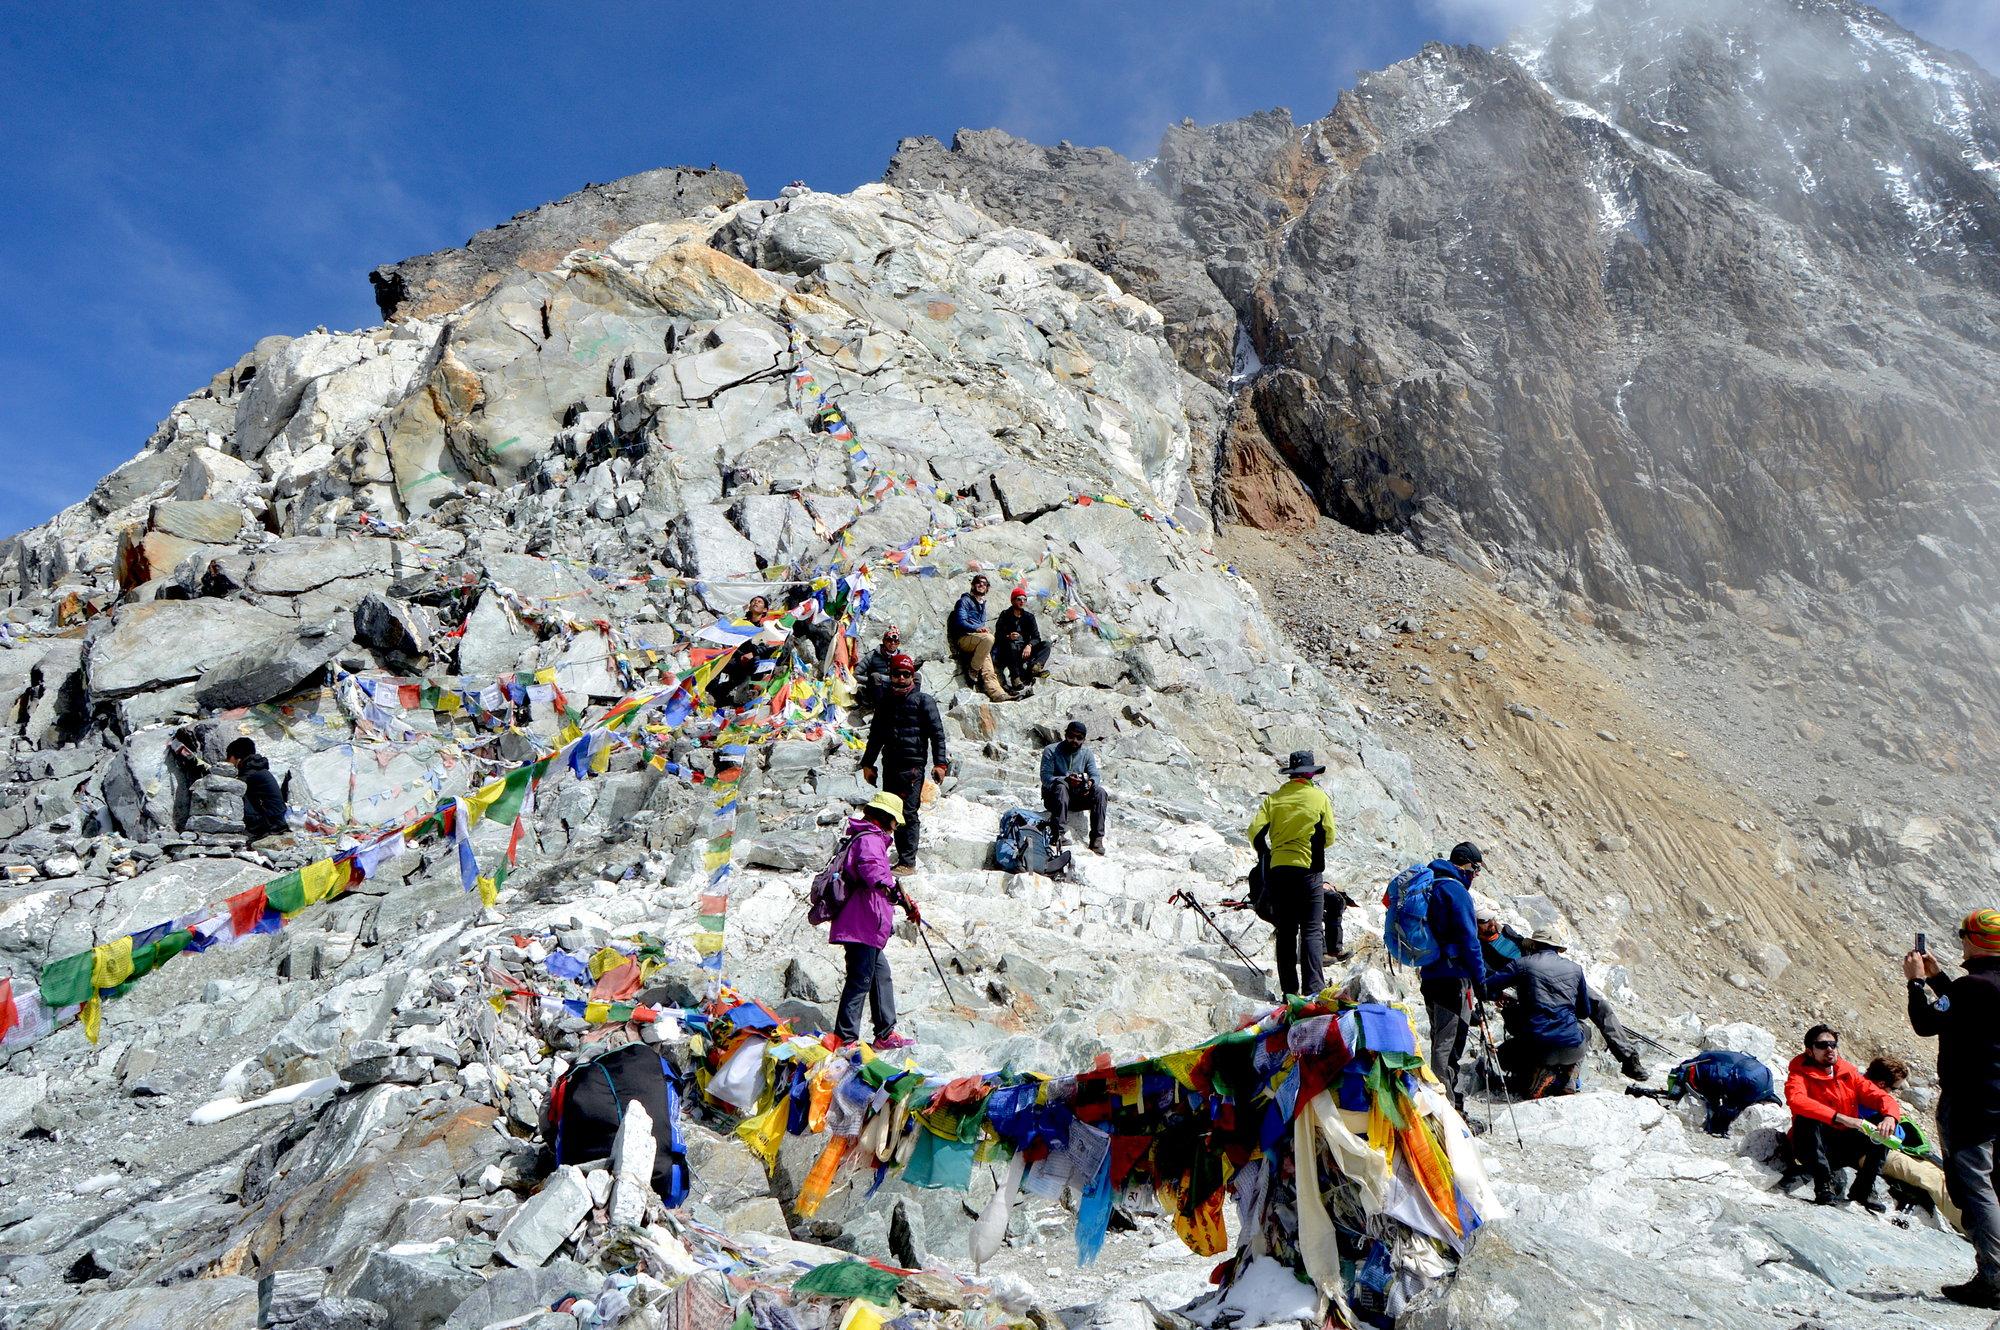 vrchol priesmyku Chola 5 420 m